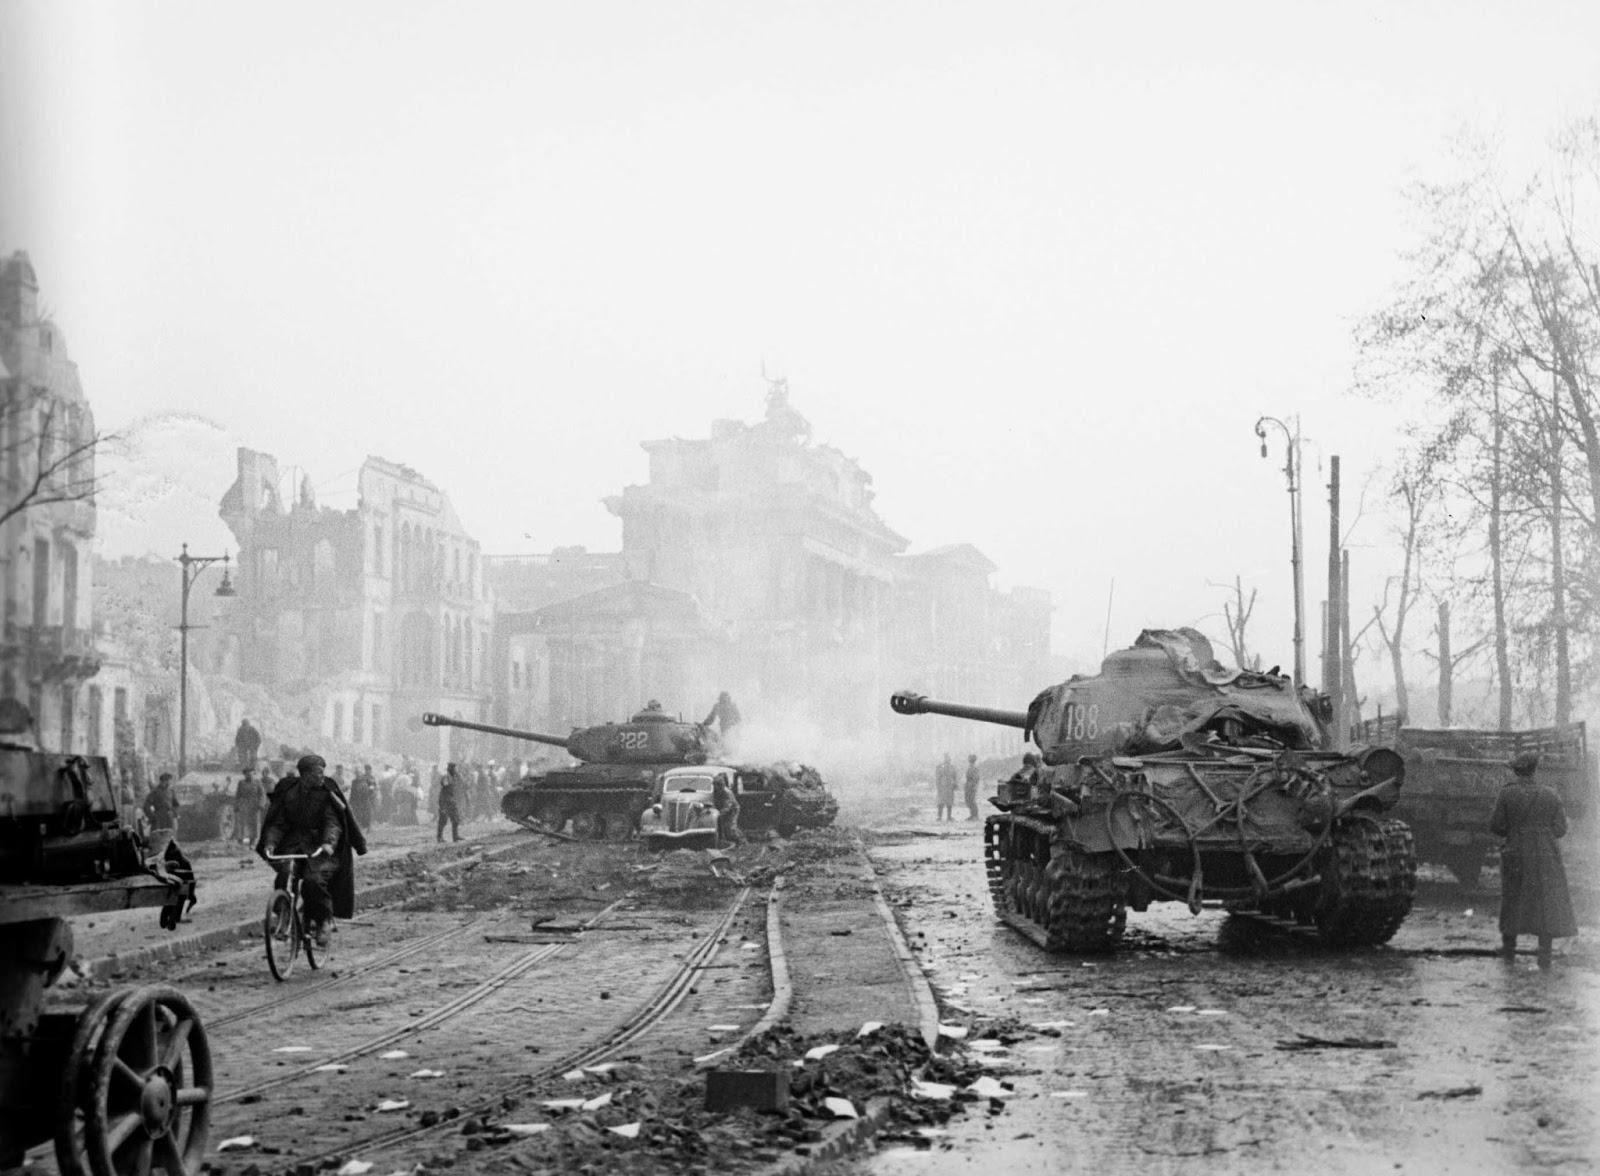 Soviet Is Tanks Watch Over Berlin Streets Combats Seems To Be Over Berlin 1945 Soviet Tank Tank Berlin